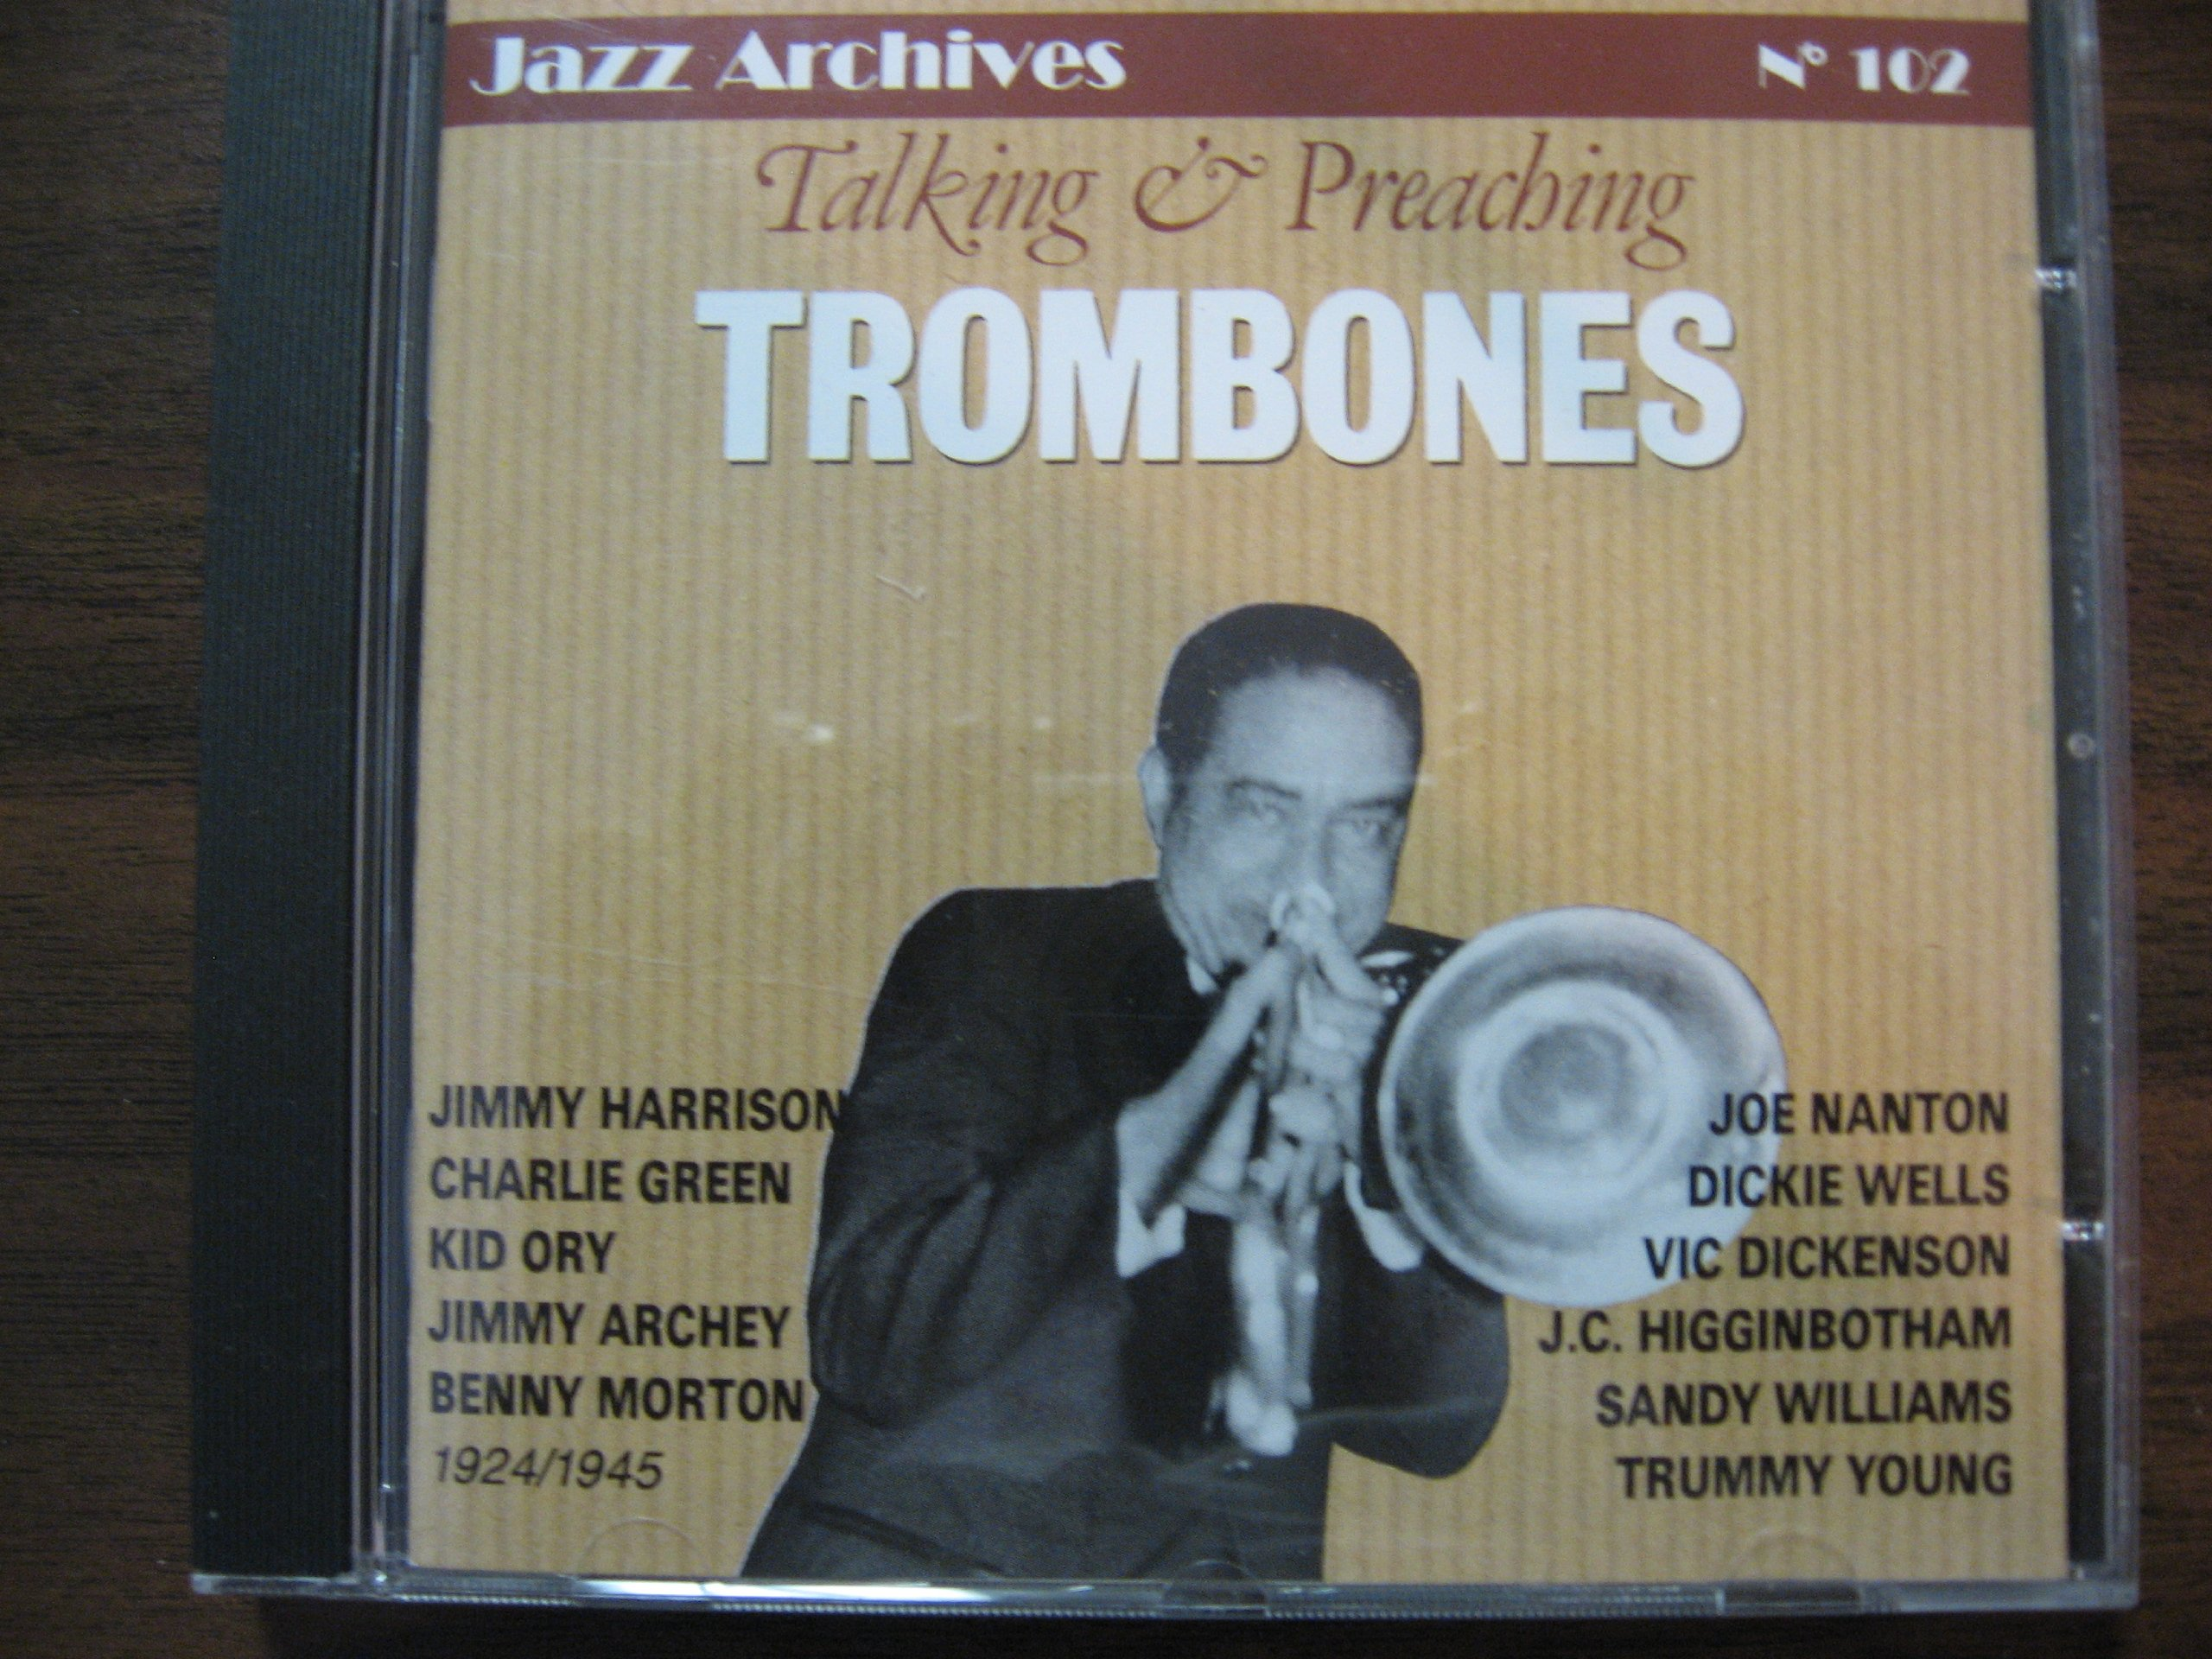 Talking & Preaching: Trombones 1924-45 by Jazz Archives